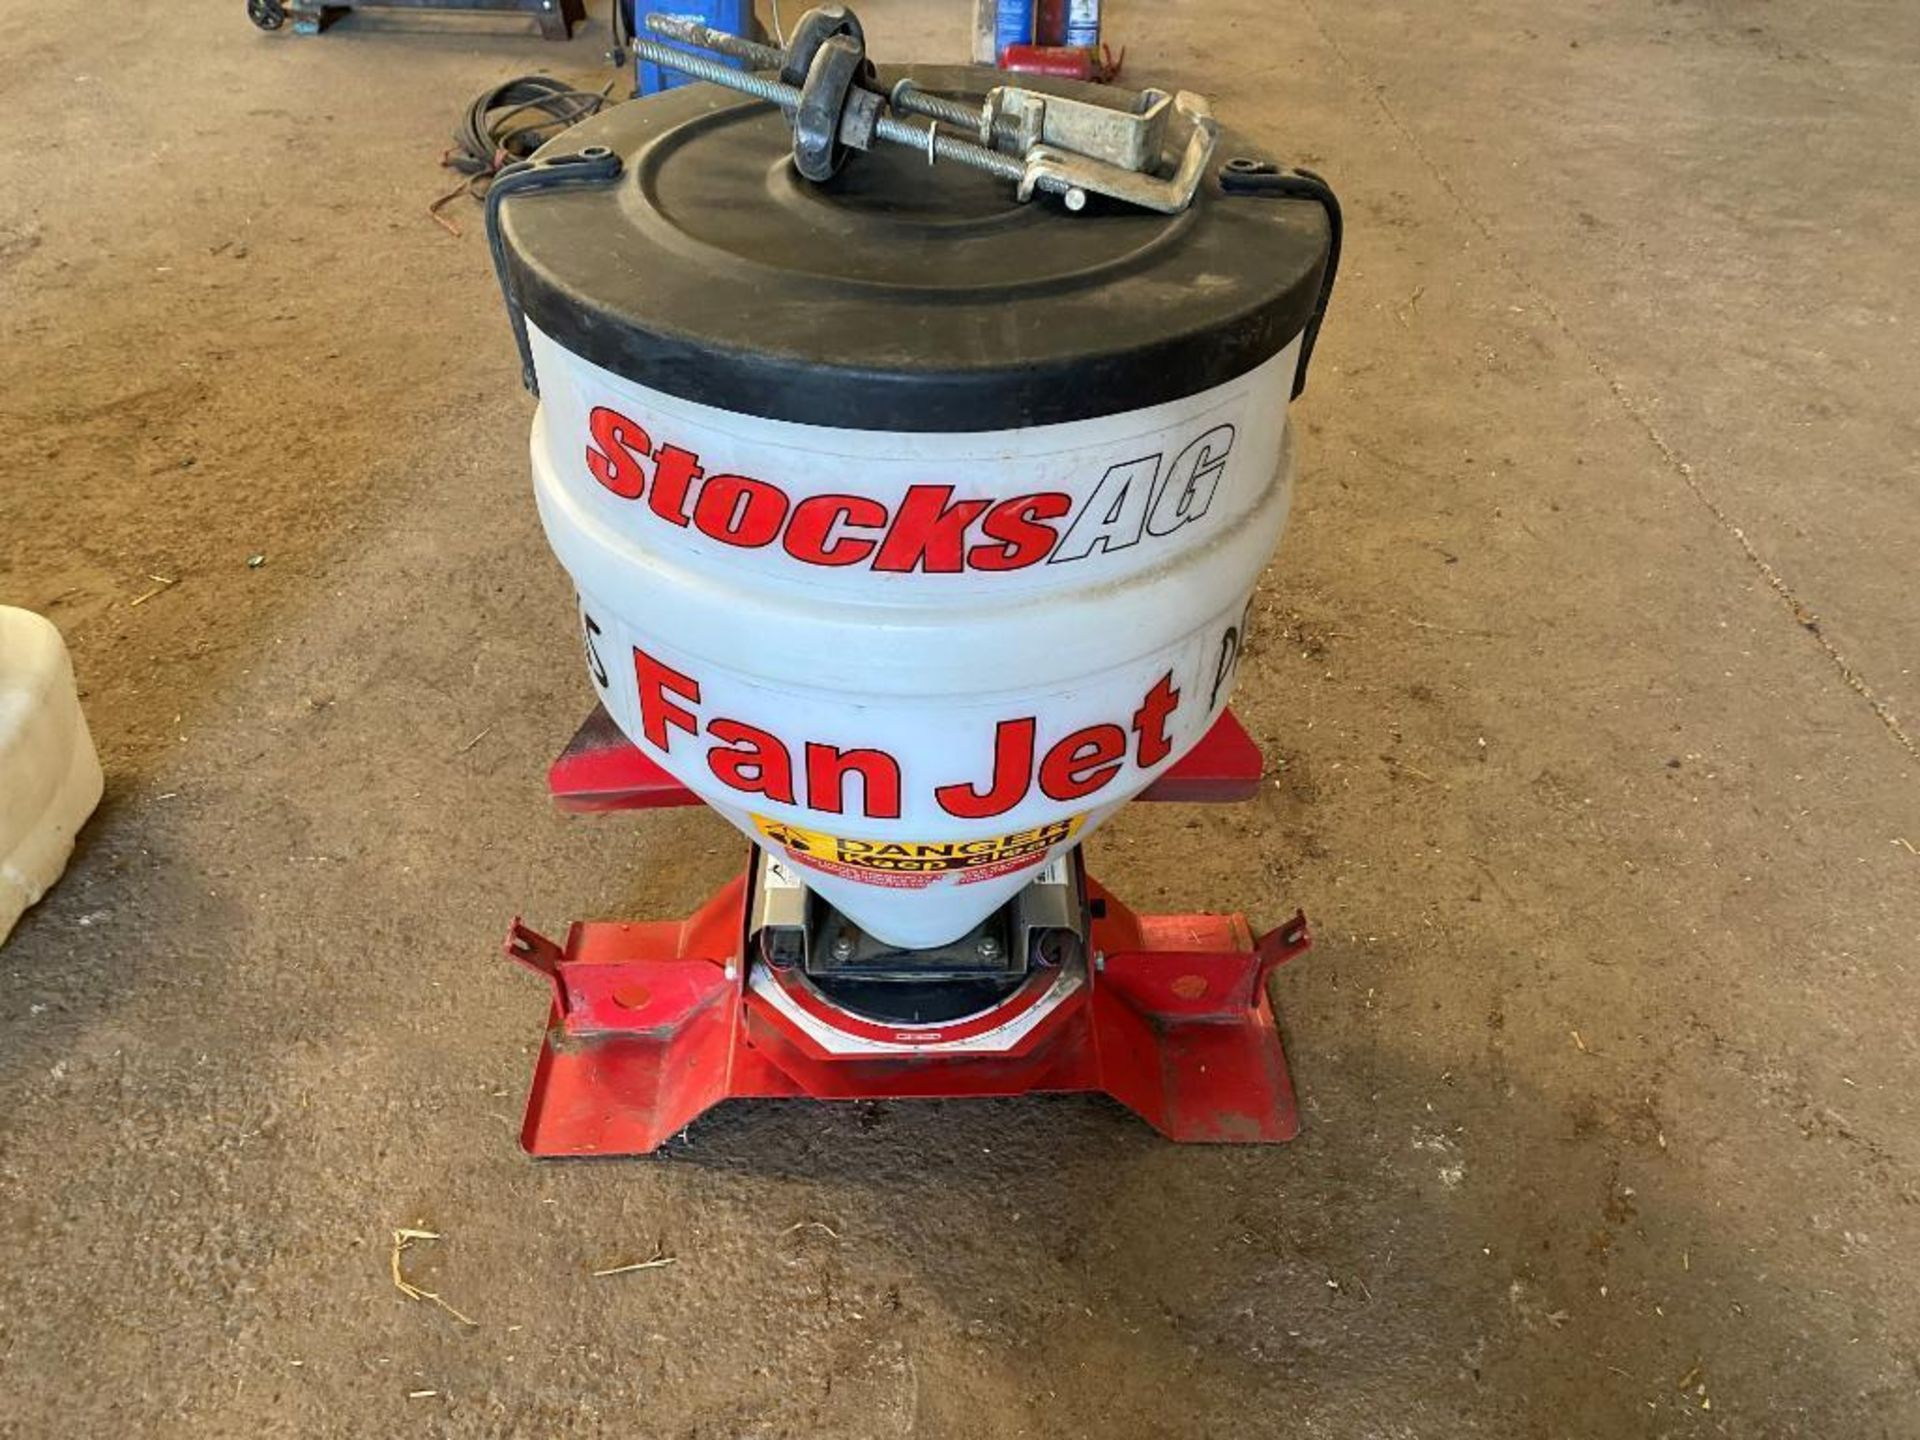 Stocks AG fan jet Slug pelleter. Control box & manual in office. - Image 2 of 4